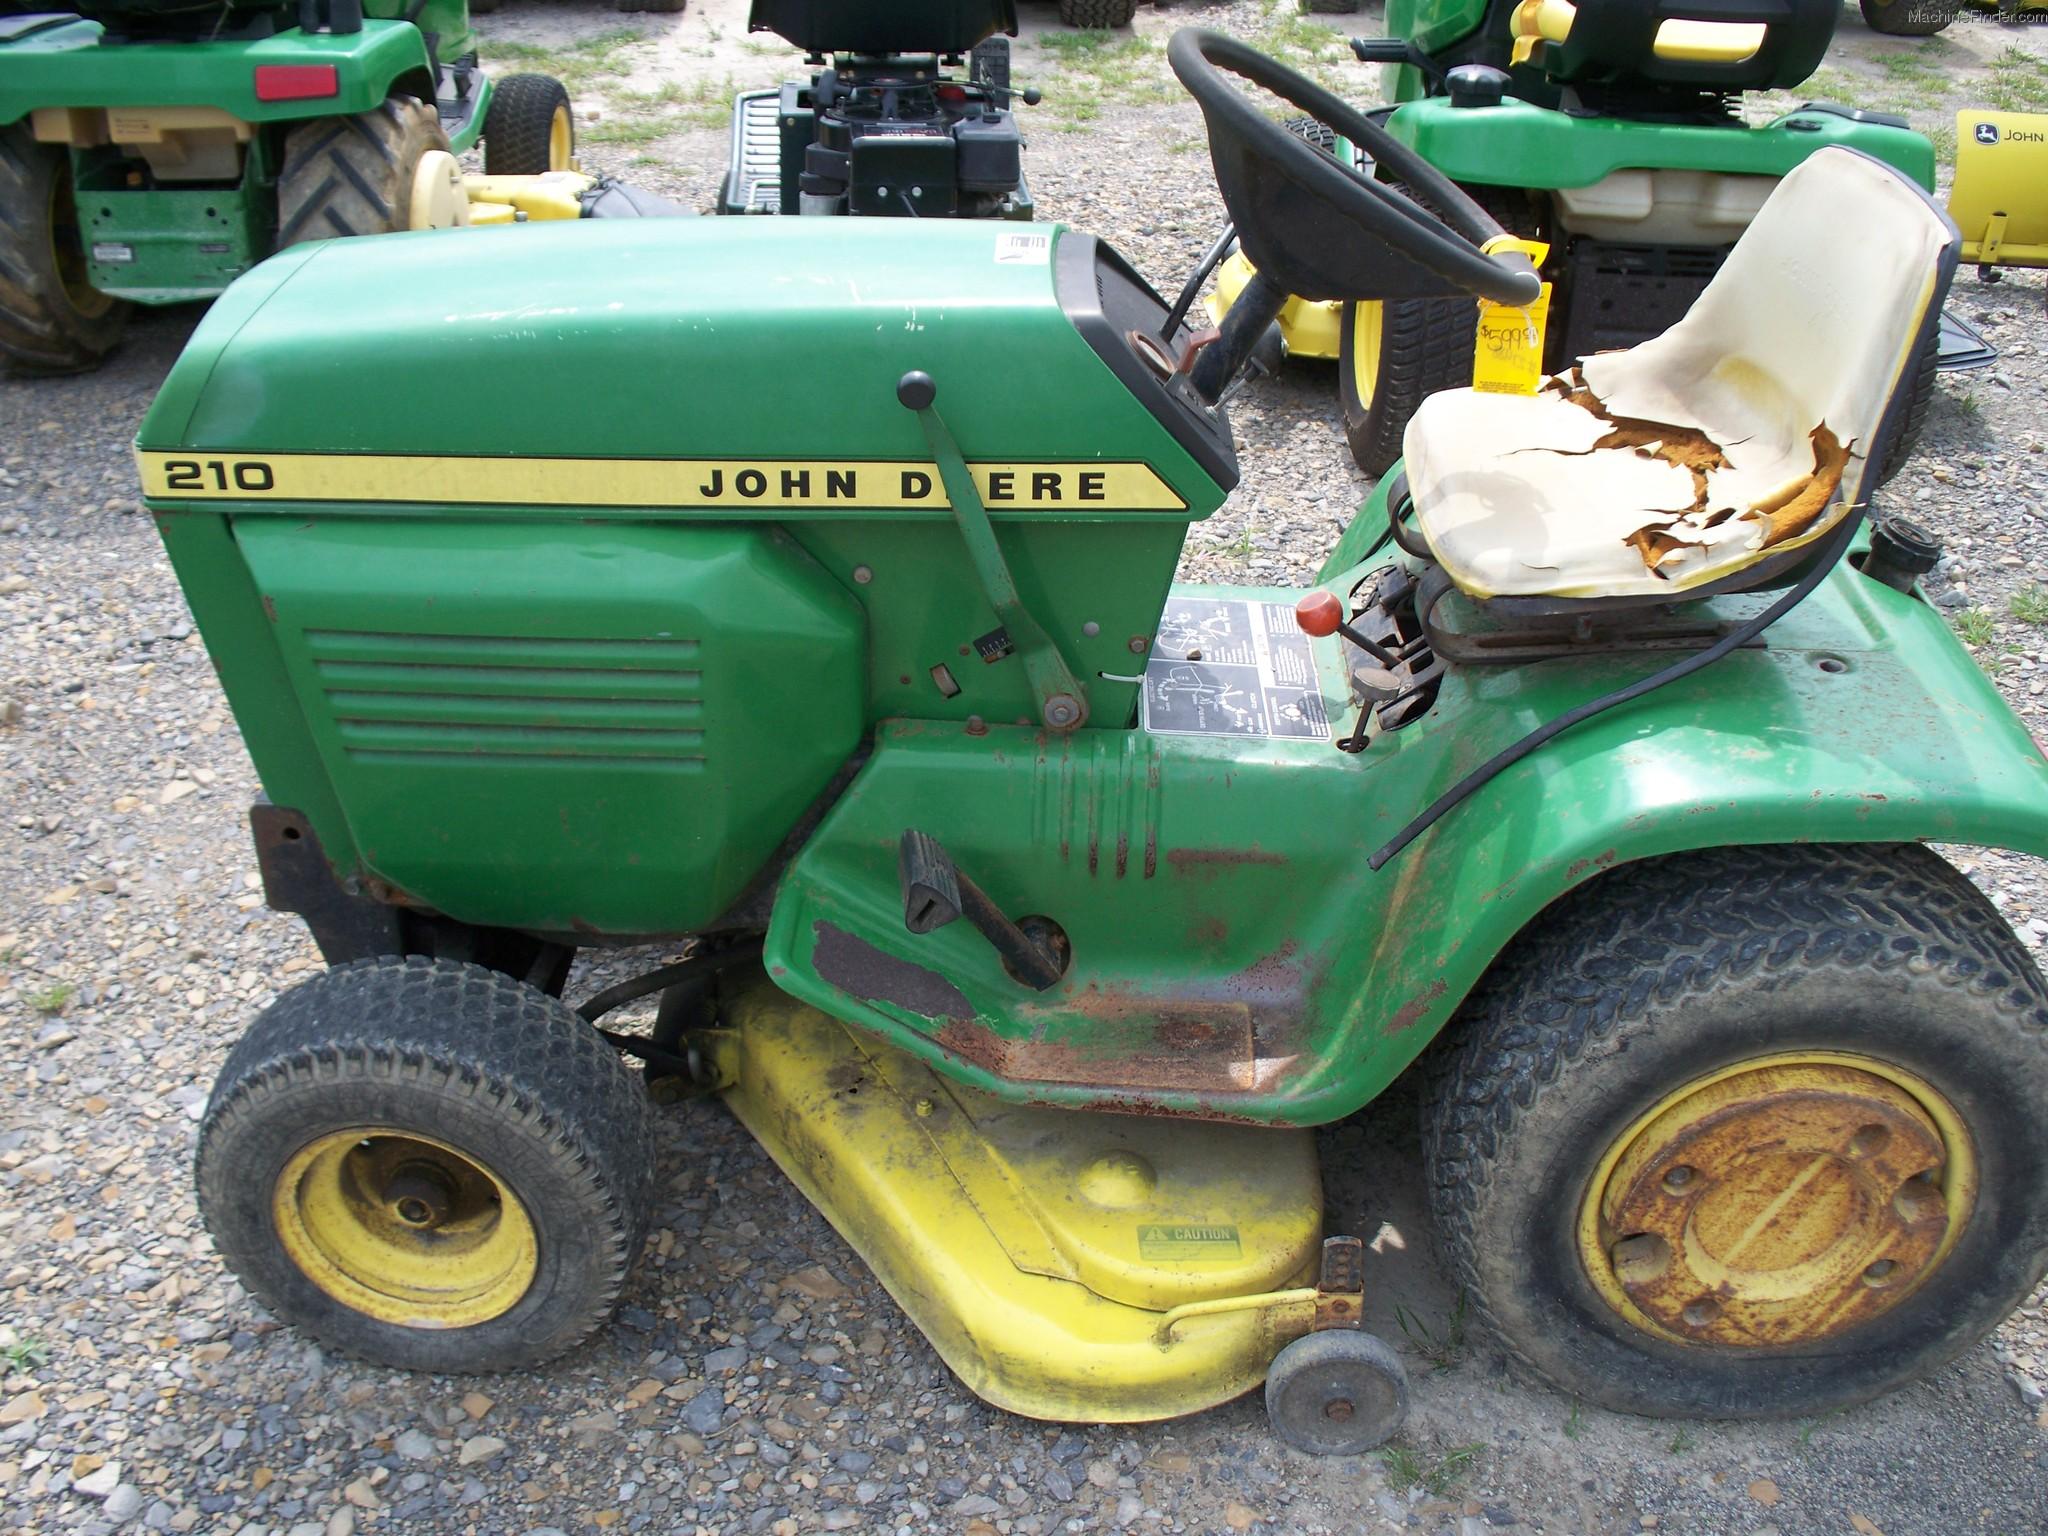 John Deere 210 Lawn & Garden and Commercial Mowing - John ...